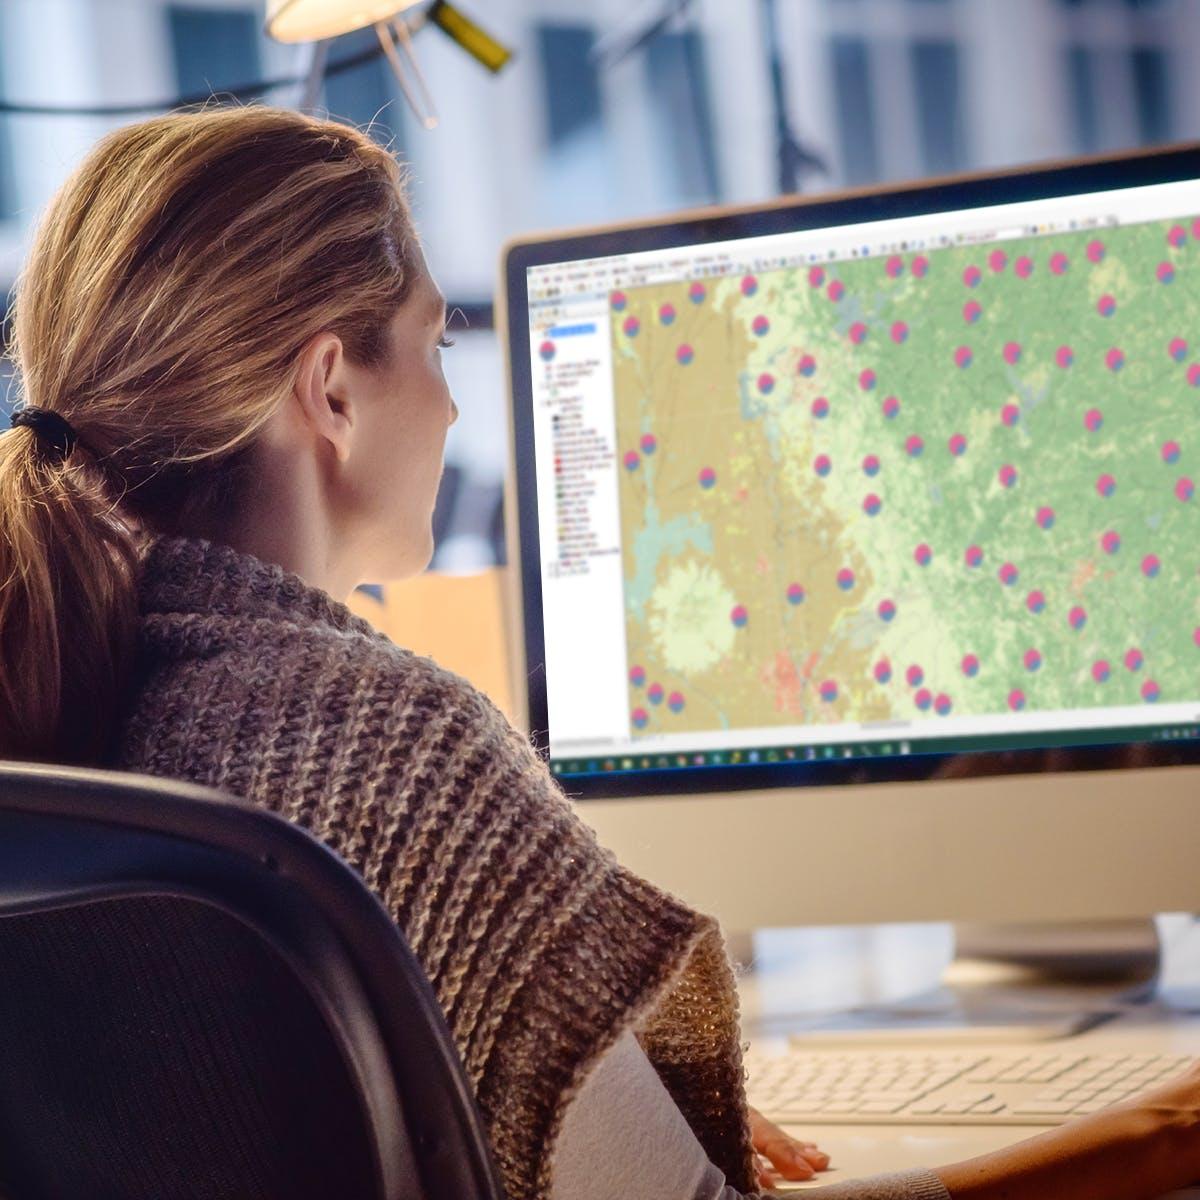 Geospatial and Environmental Analysis